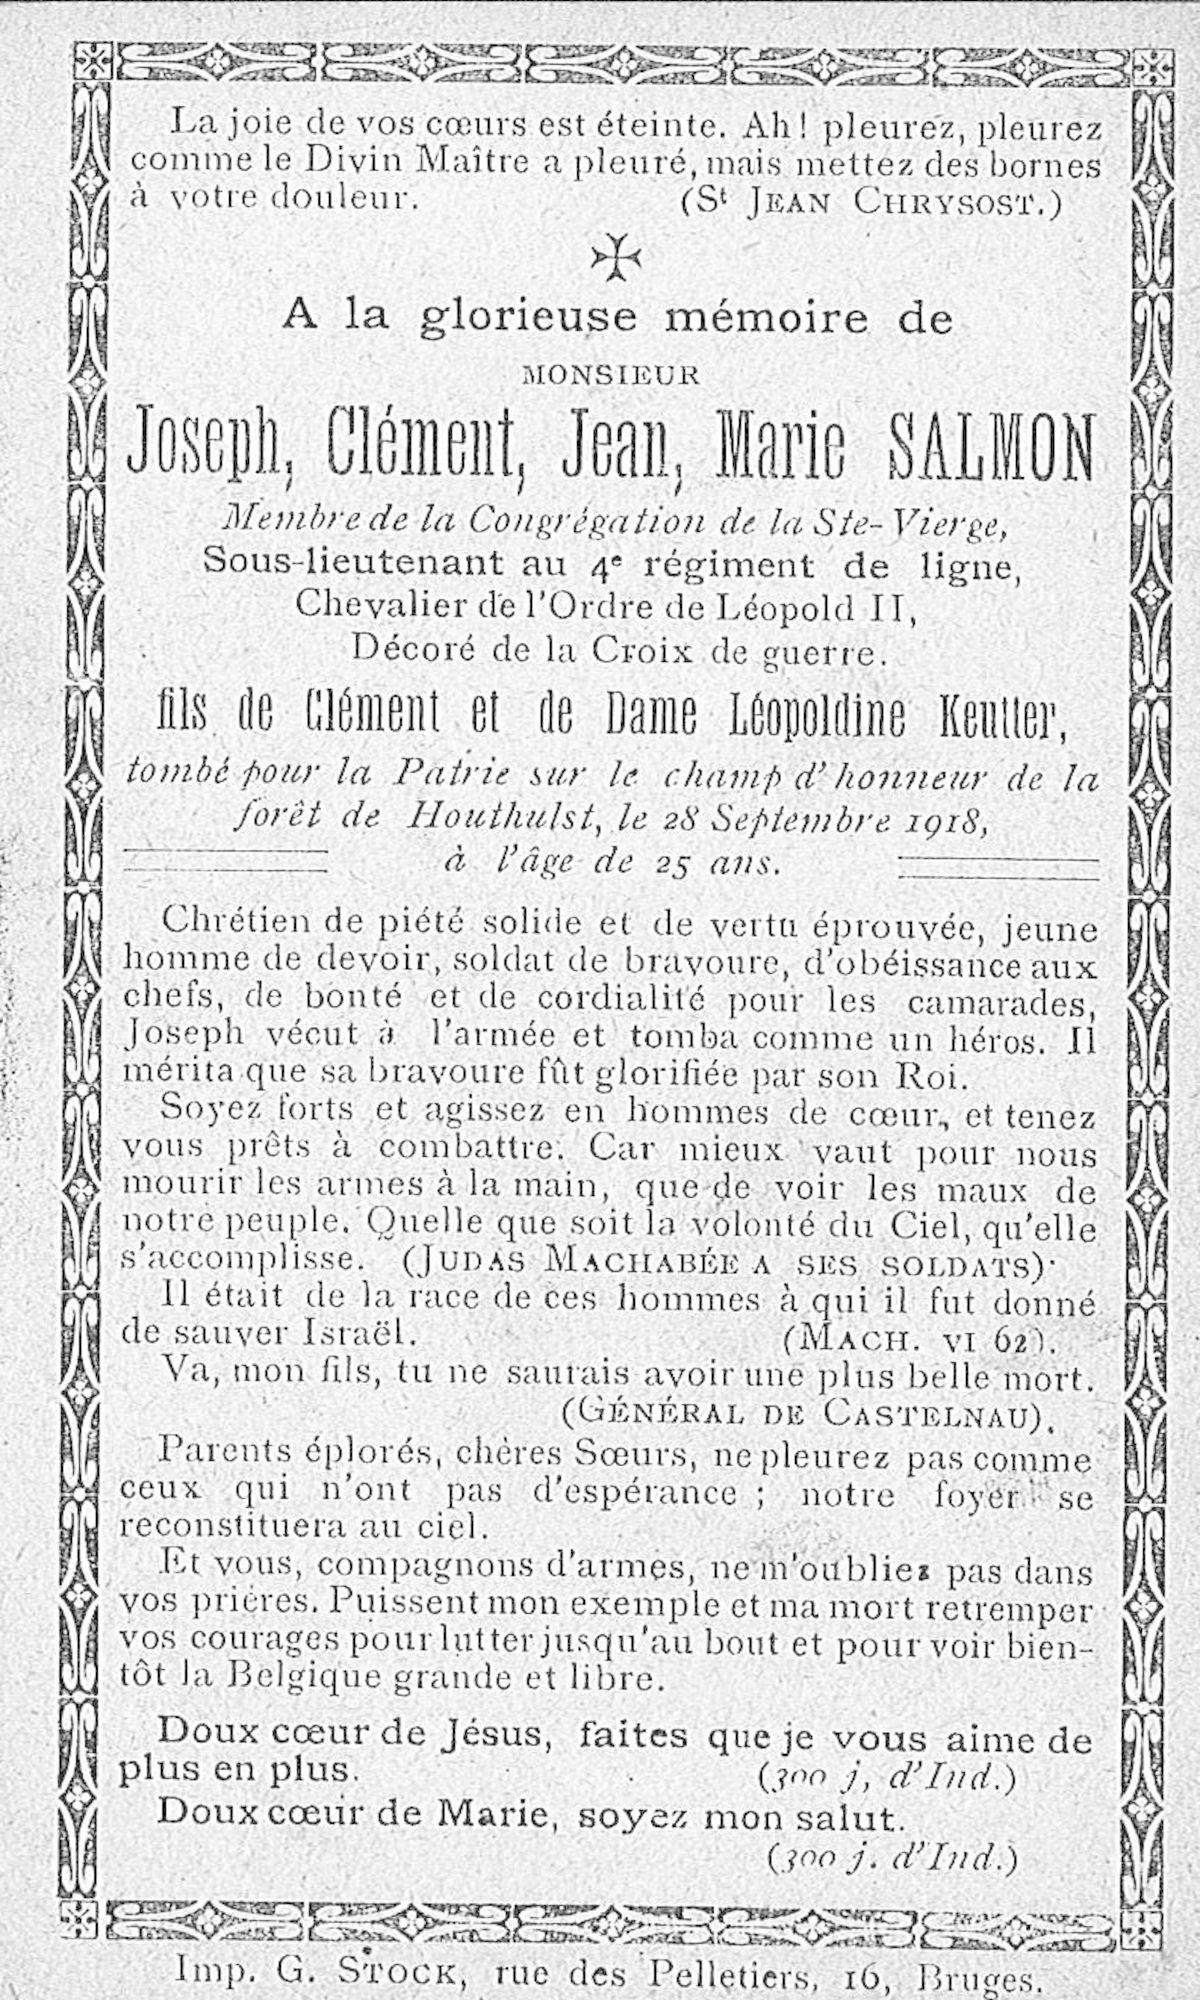 Joseph-Clément-Jean-Marie Salmon